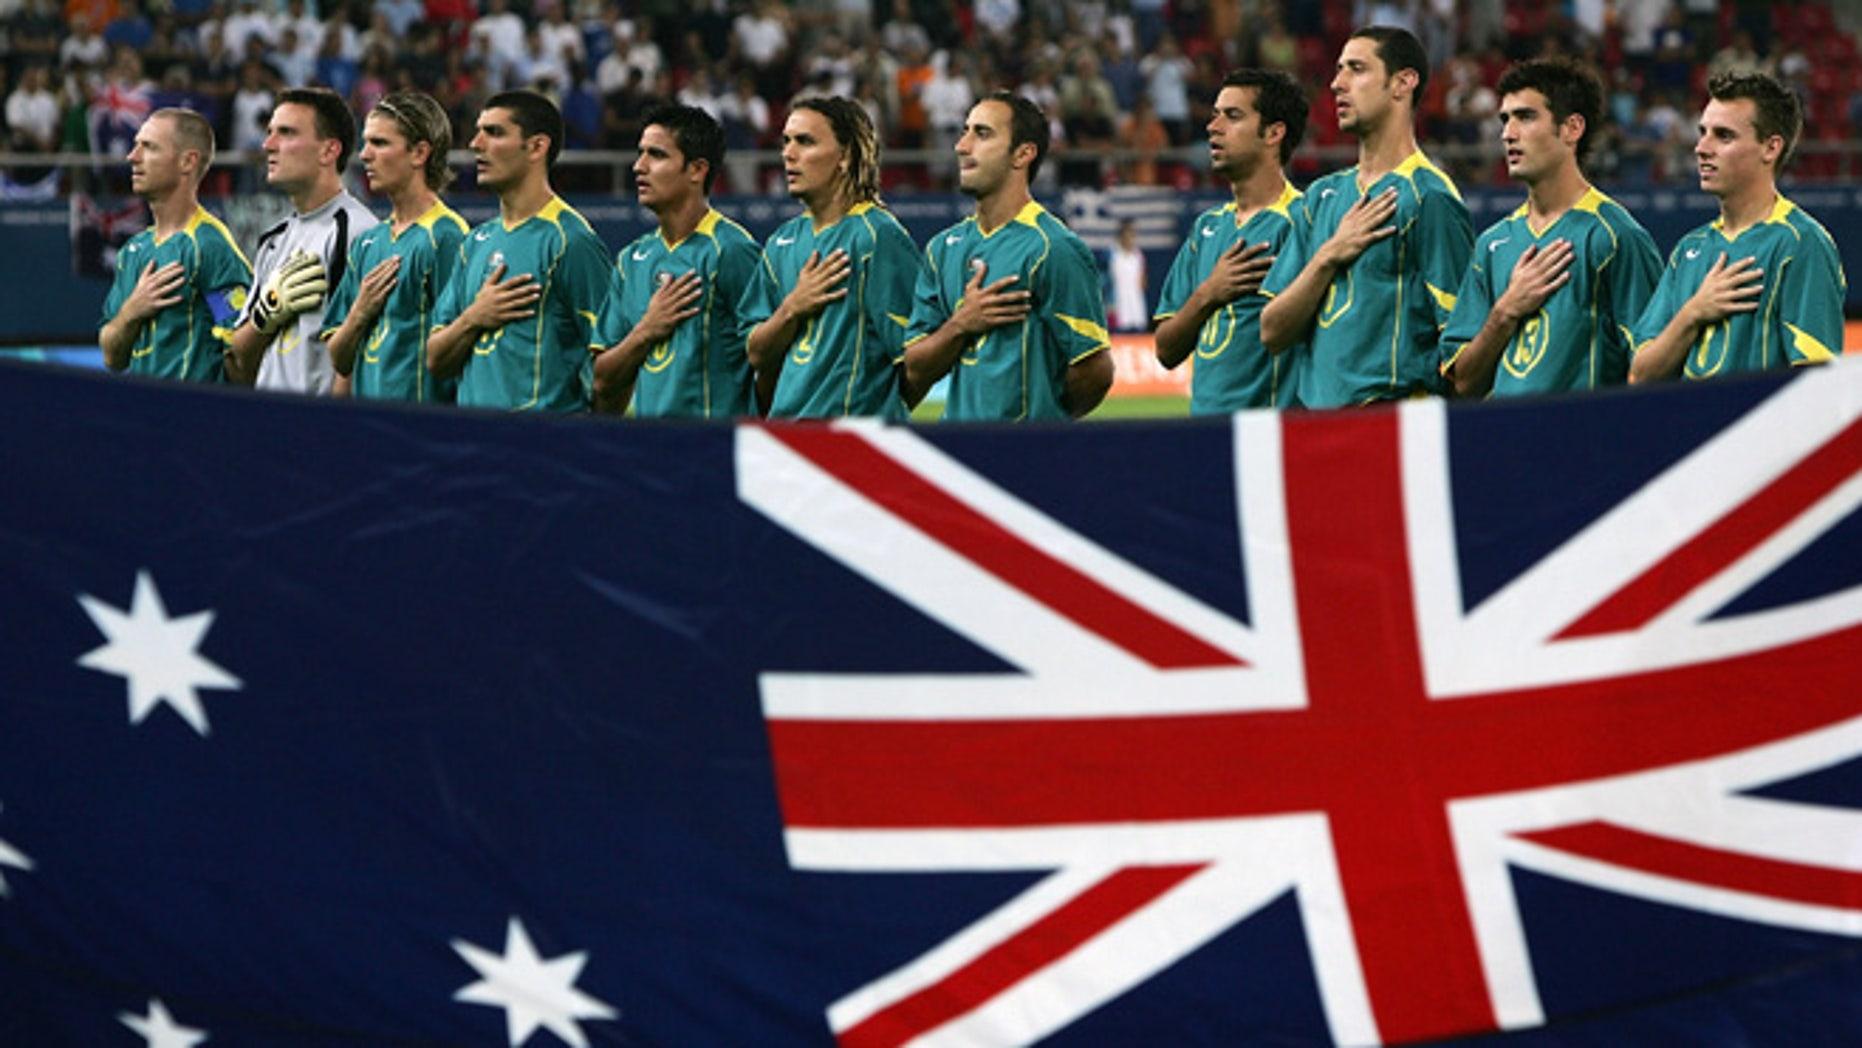 The Australian soccer team during the Athens 2004 Summer Olympic Games at Karaiskaki Stadium.